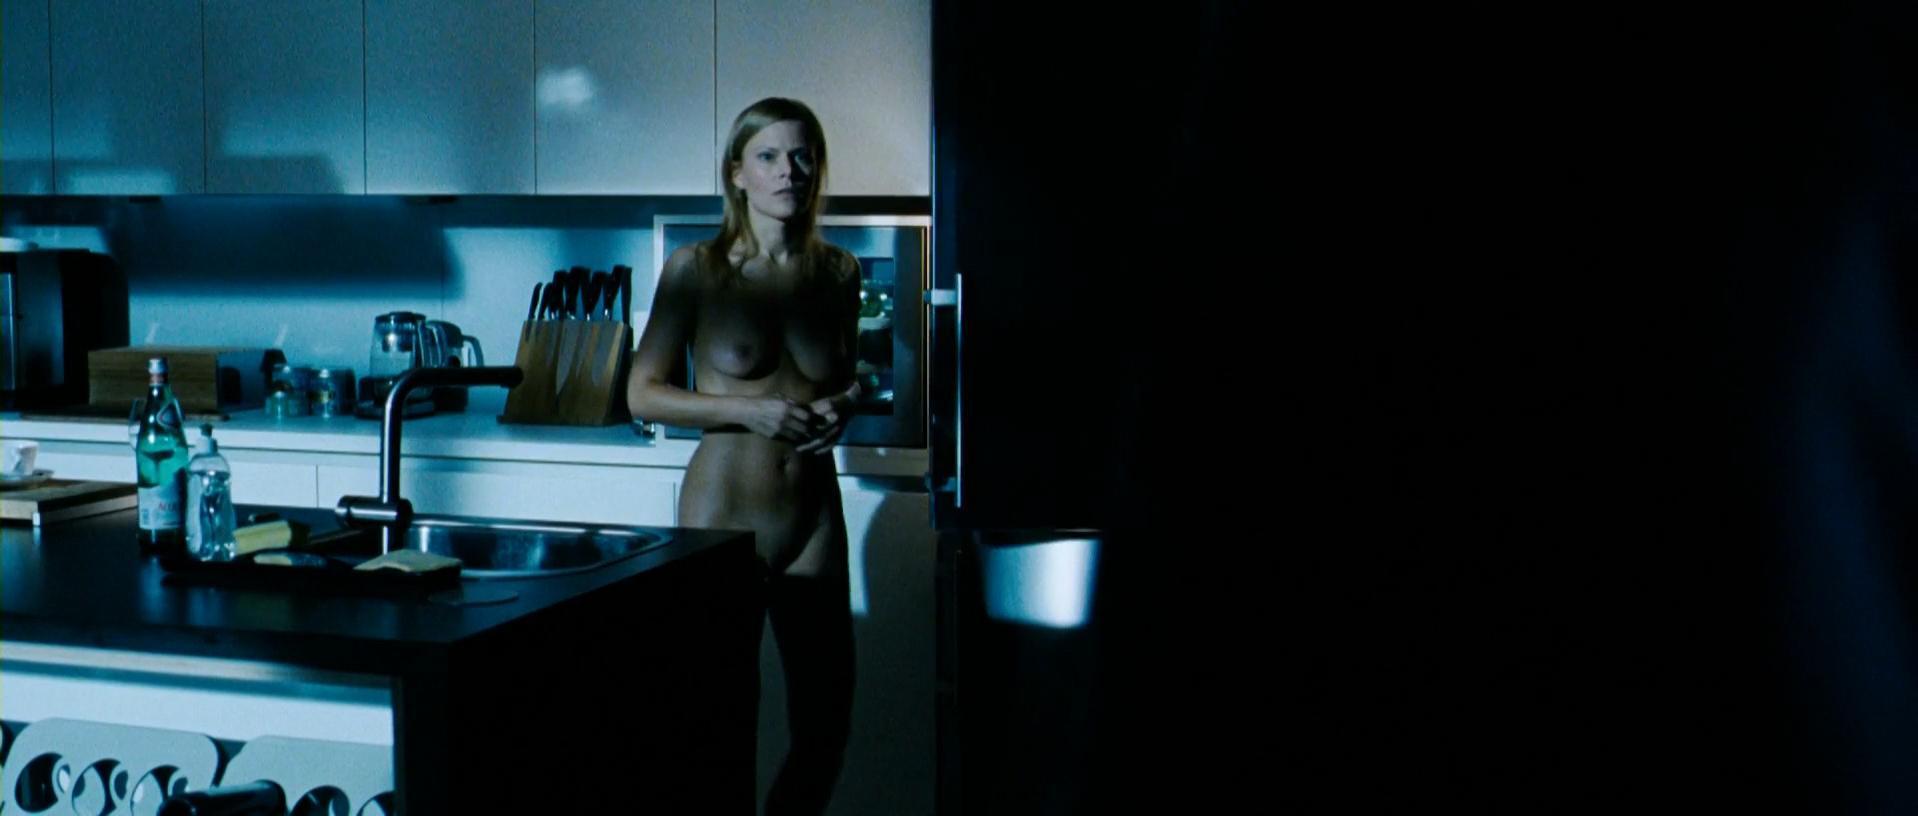 Noemi Besedes nude - Mann tut was Mann kann (2012)